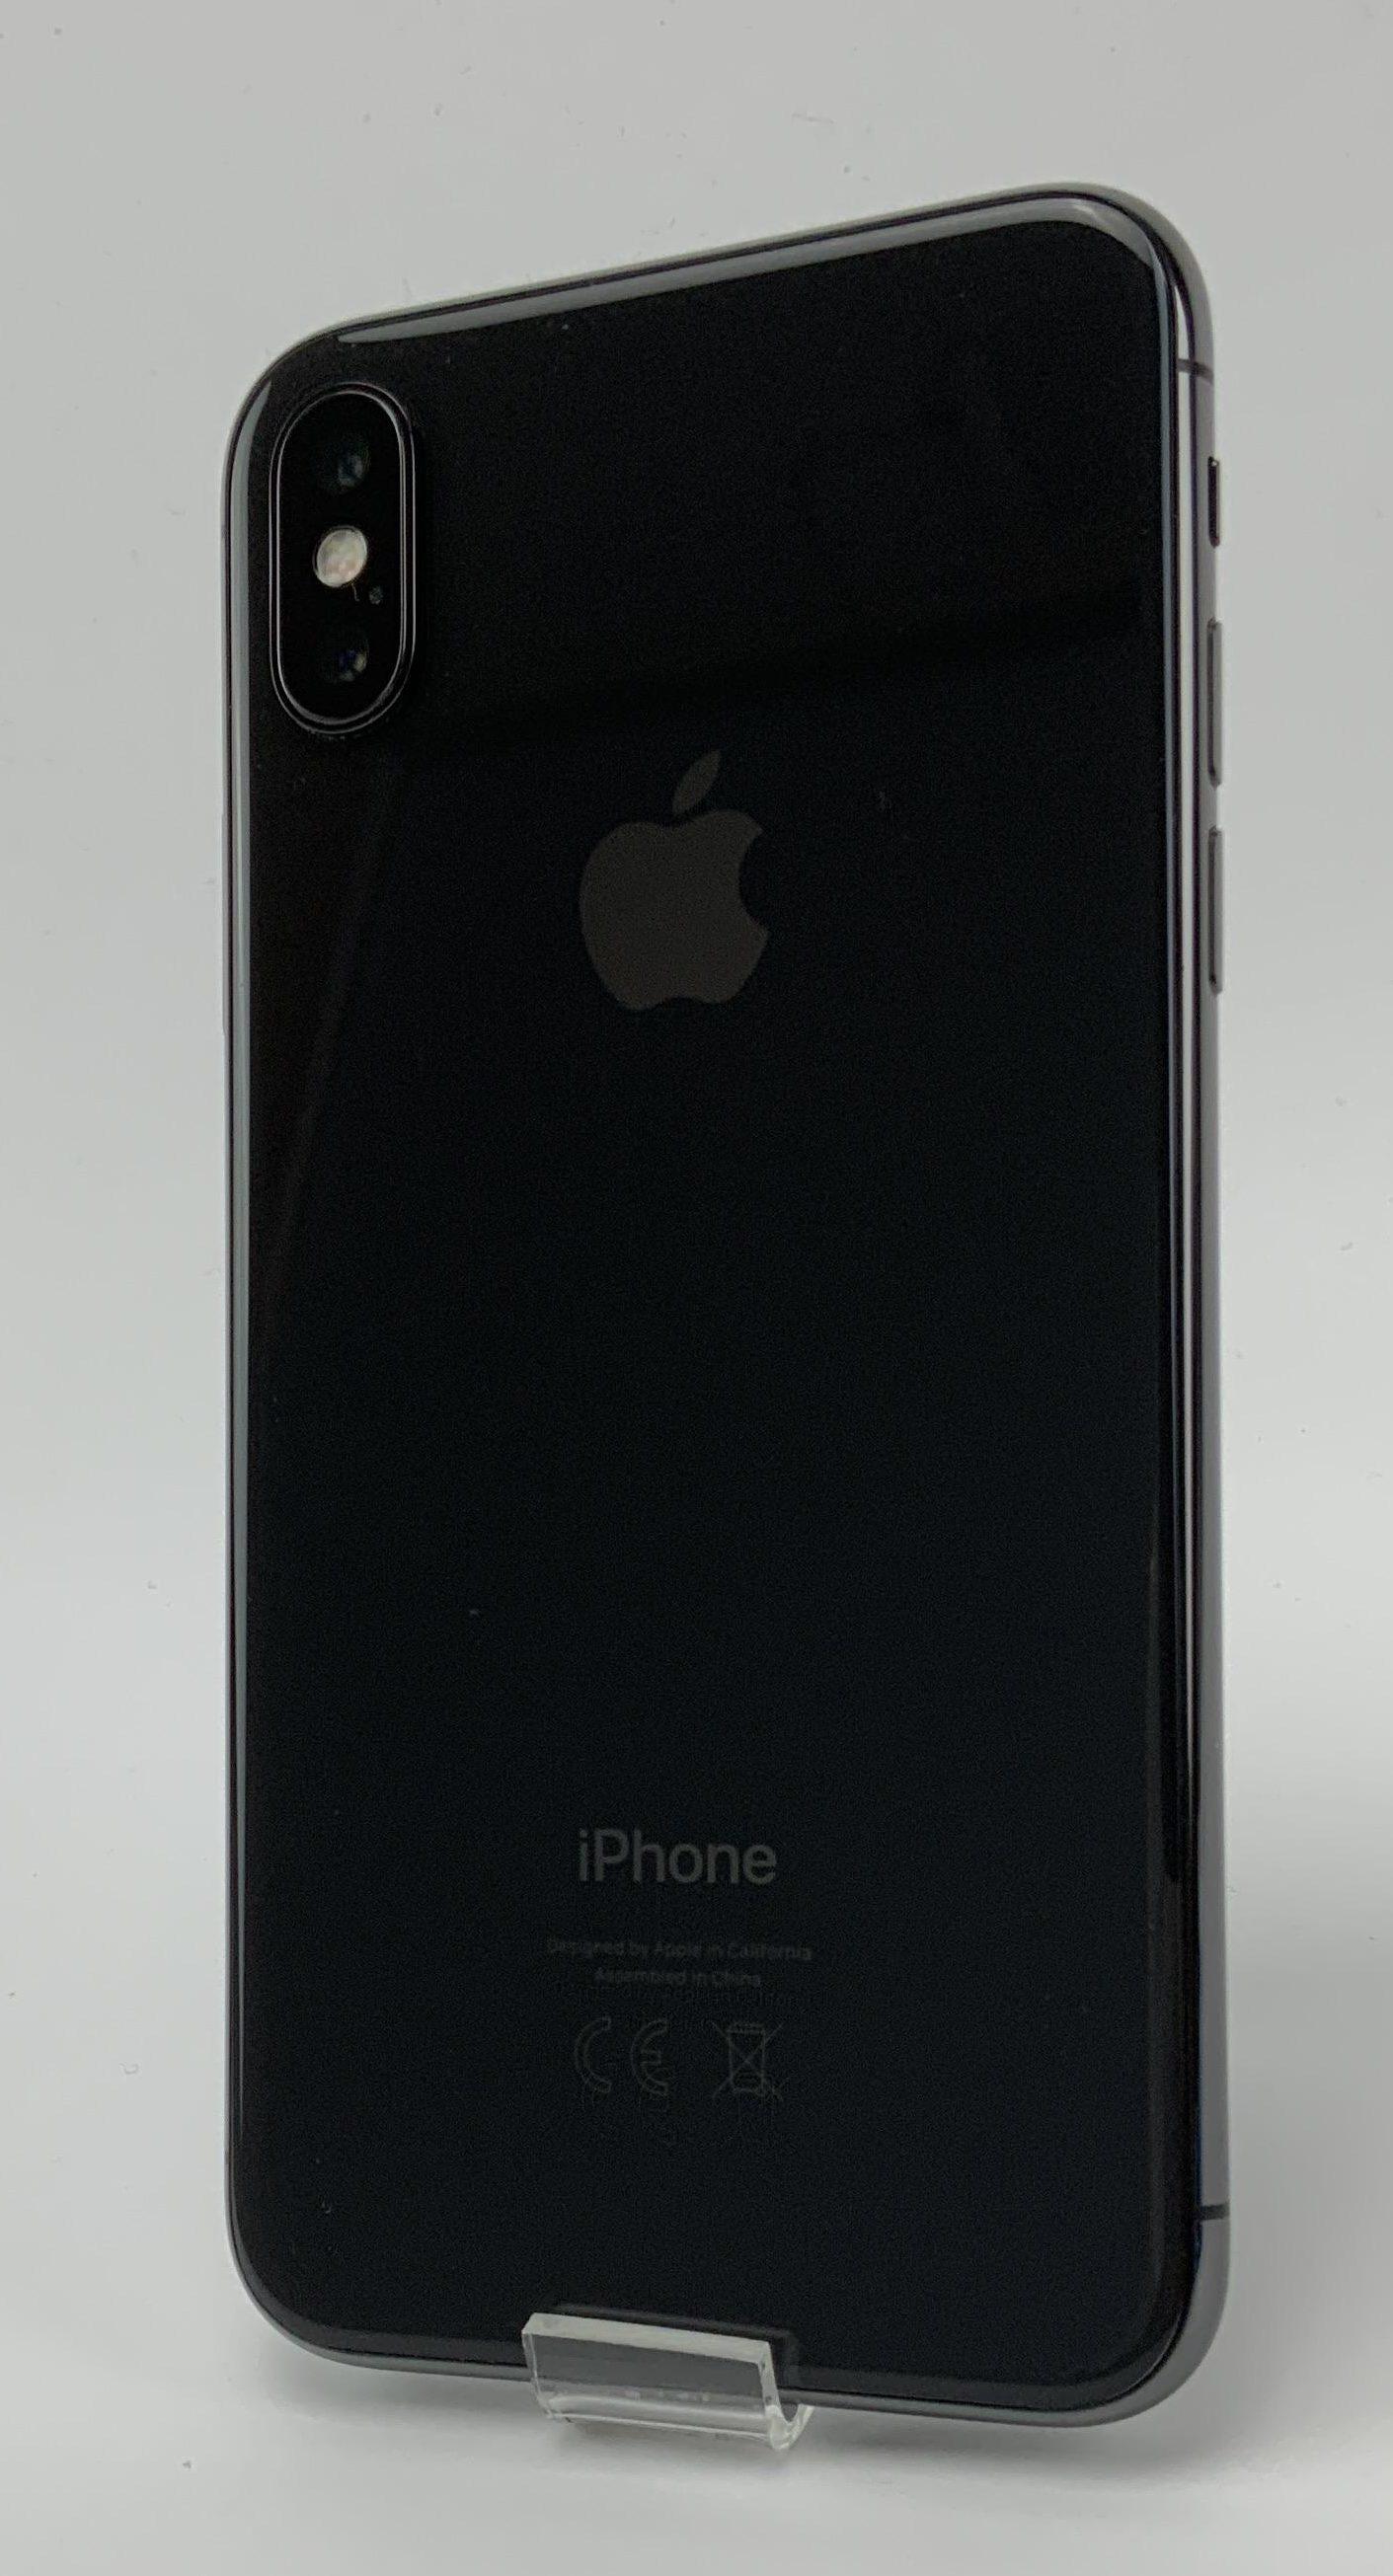 iPhone X 64GB, 64GB, Space Gray, image 2